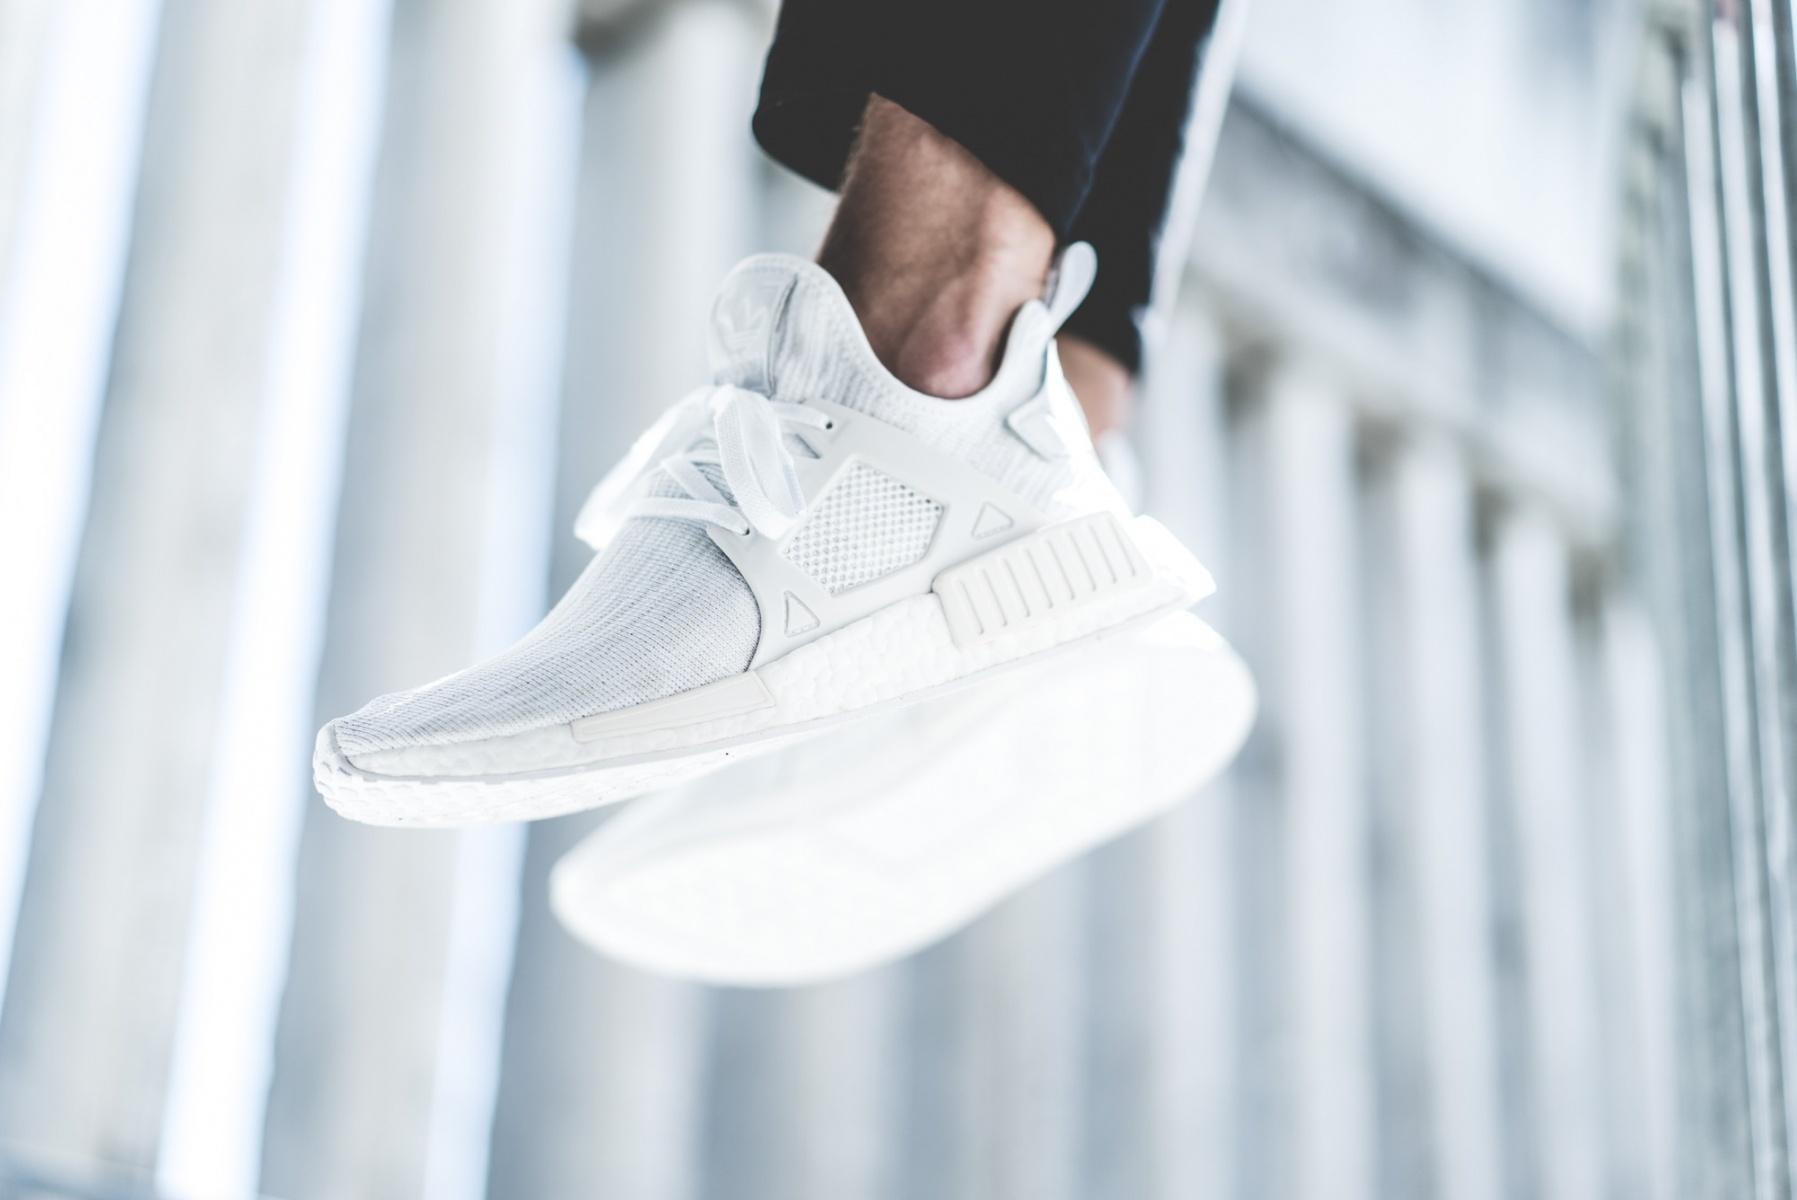 Restock Adidas Nmd Xr1 Primeknit Triple White Sneaker Shouts